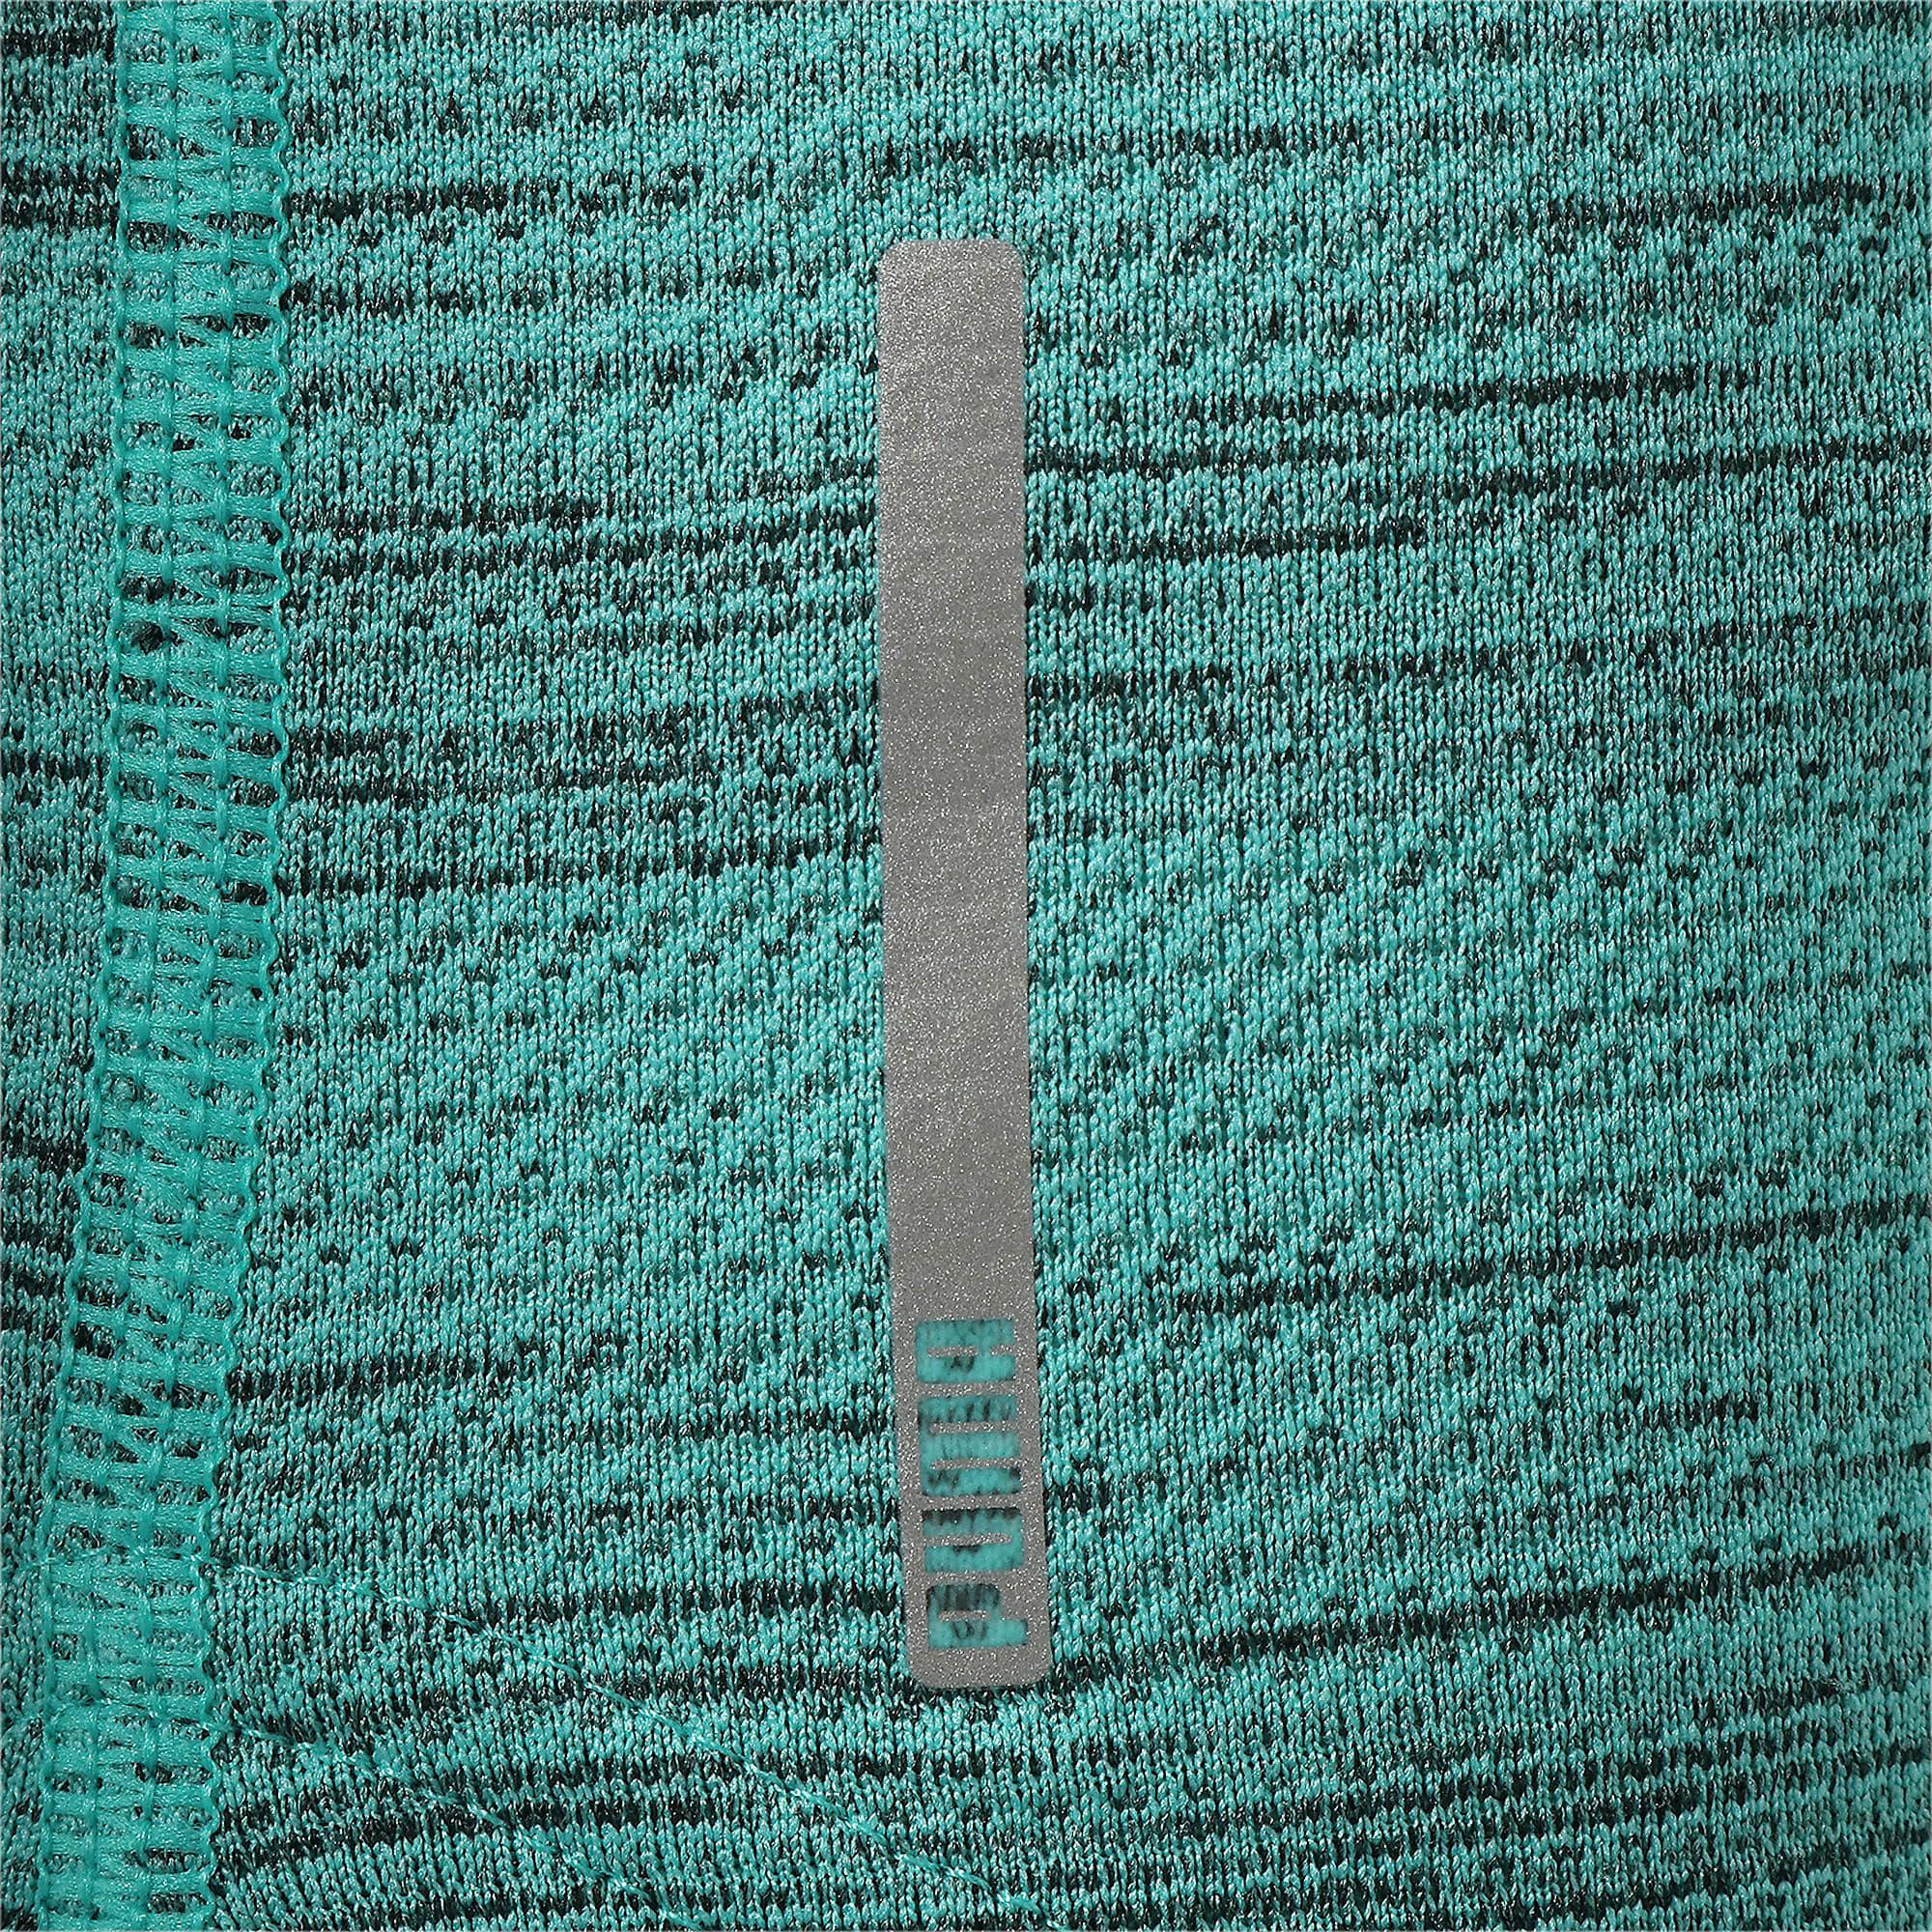 Thumbnail 11 of LAST LAP ヘザー SS ランニング Tシャツ 半袖, Blue Turquoise Heather, medium-JPN